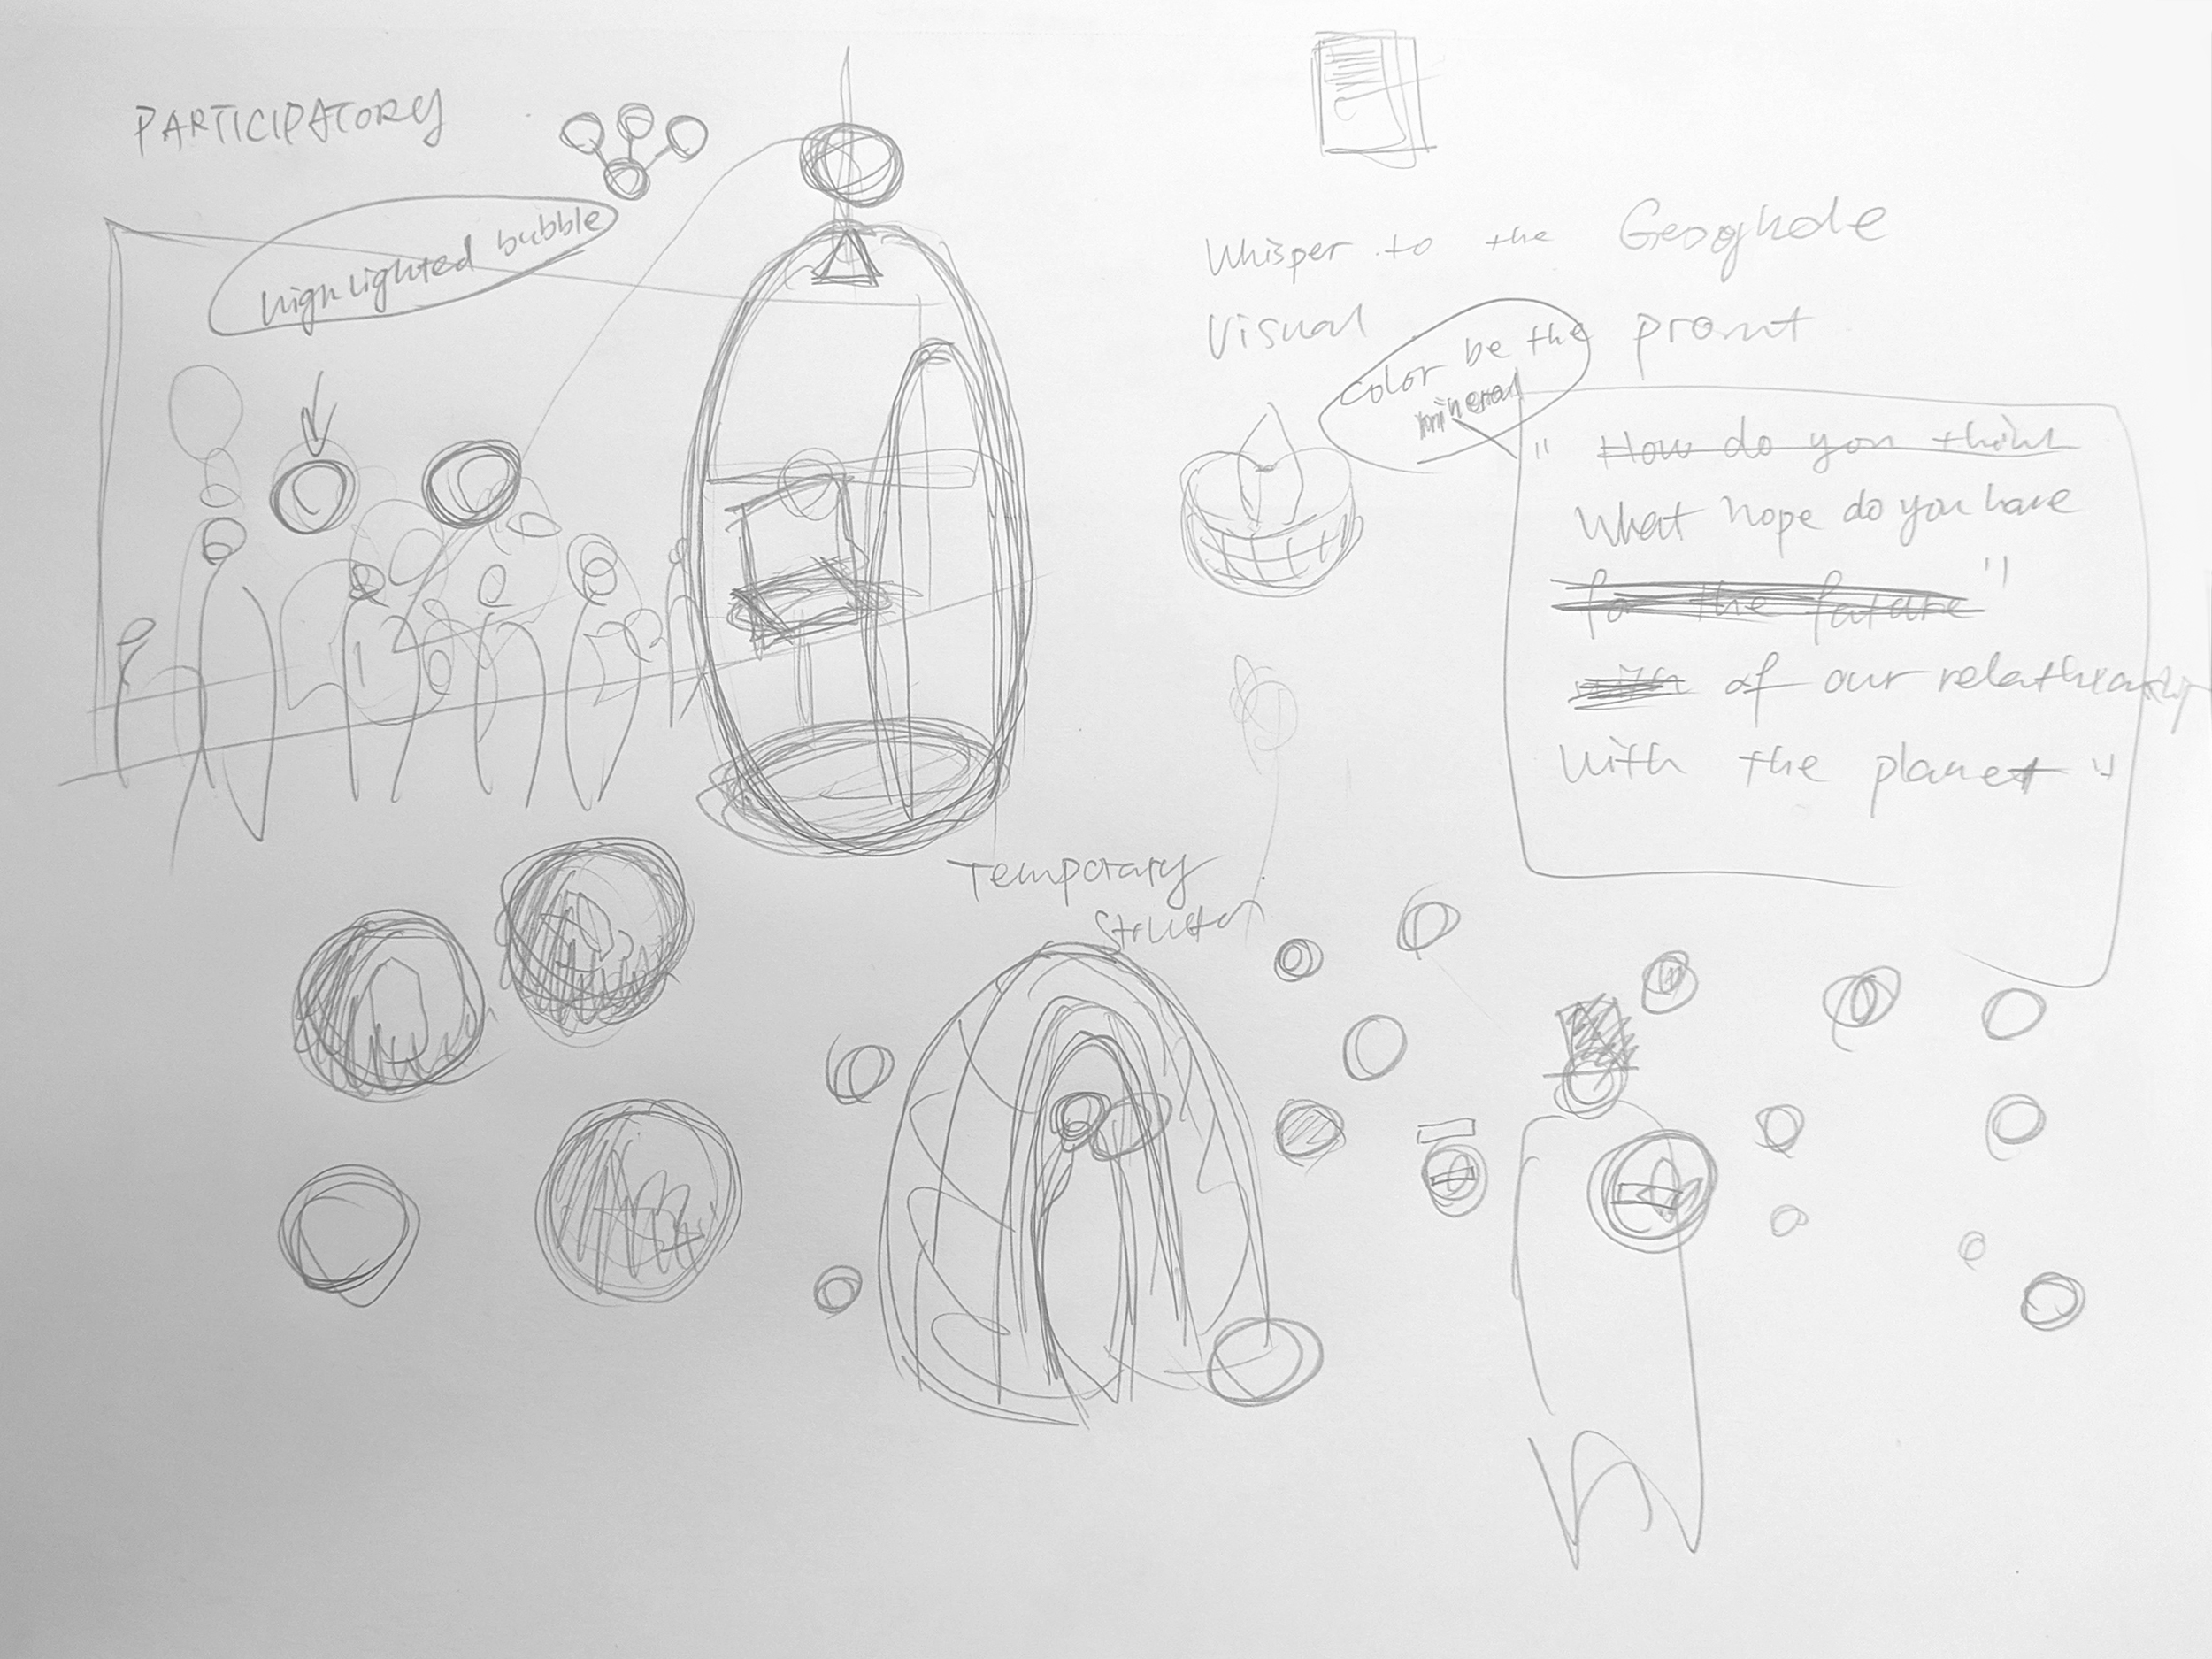 participatory sketch